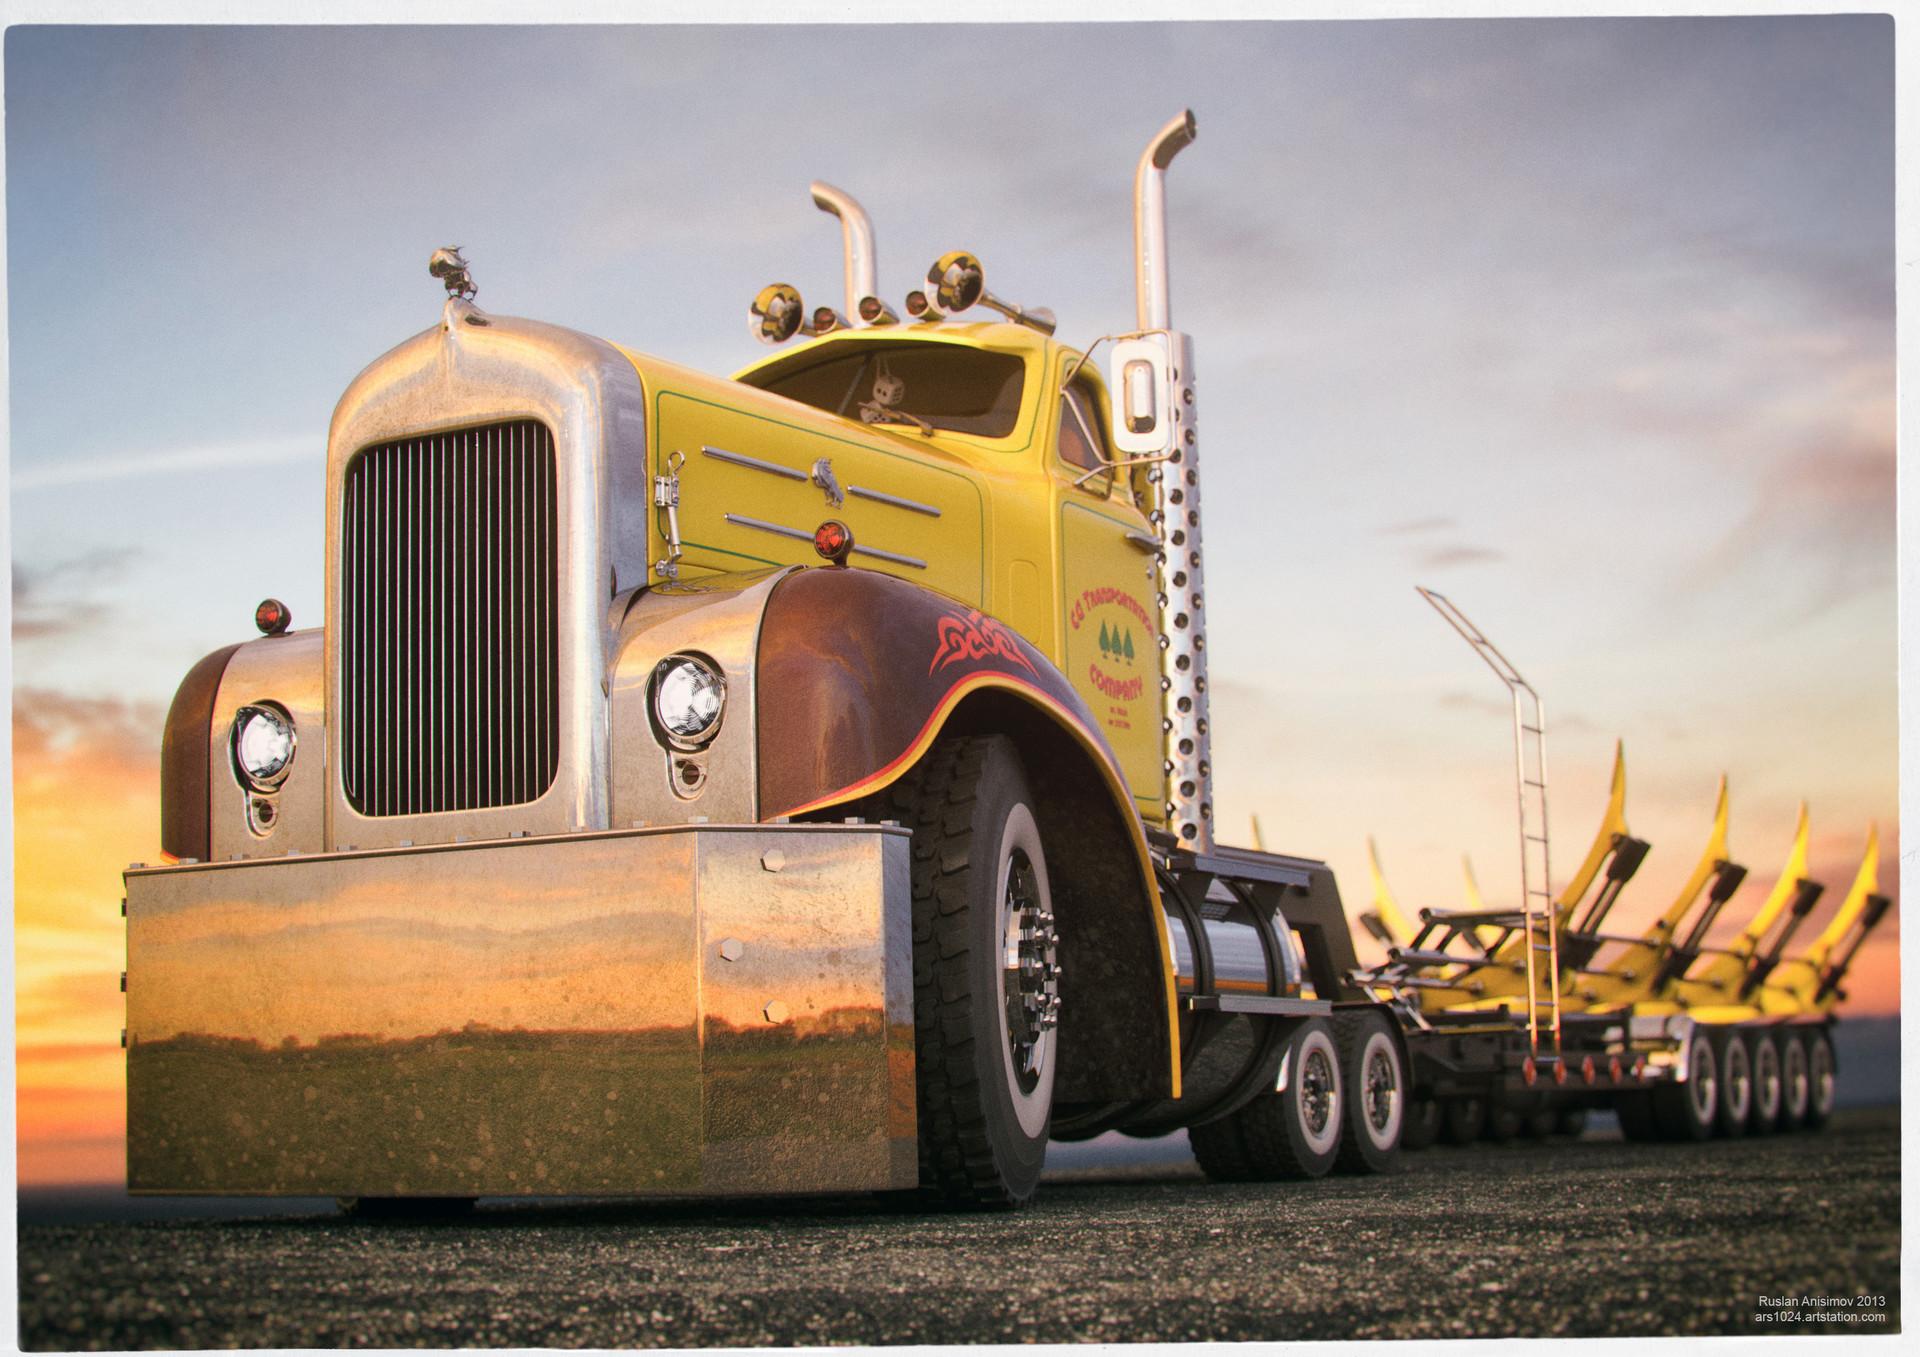 Ruslan anisimov 2013 truck03